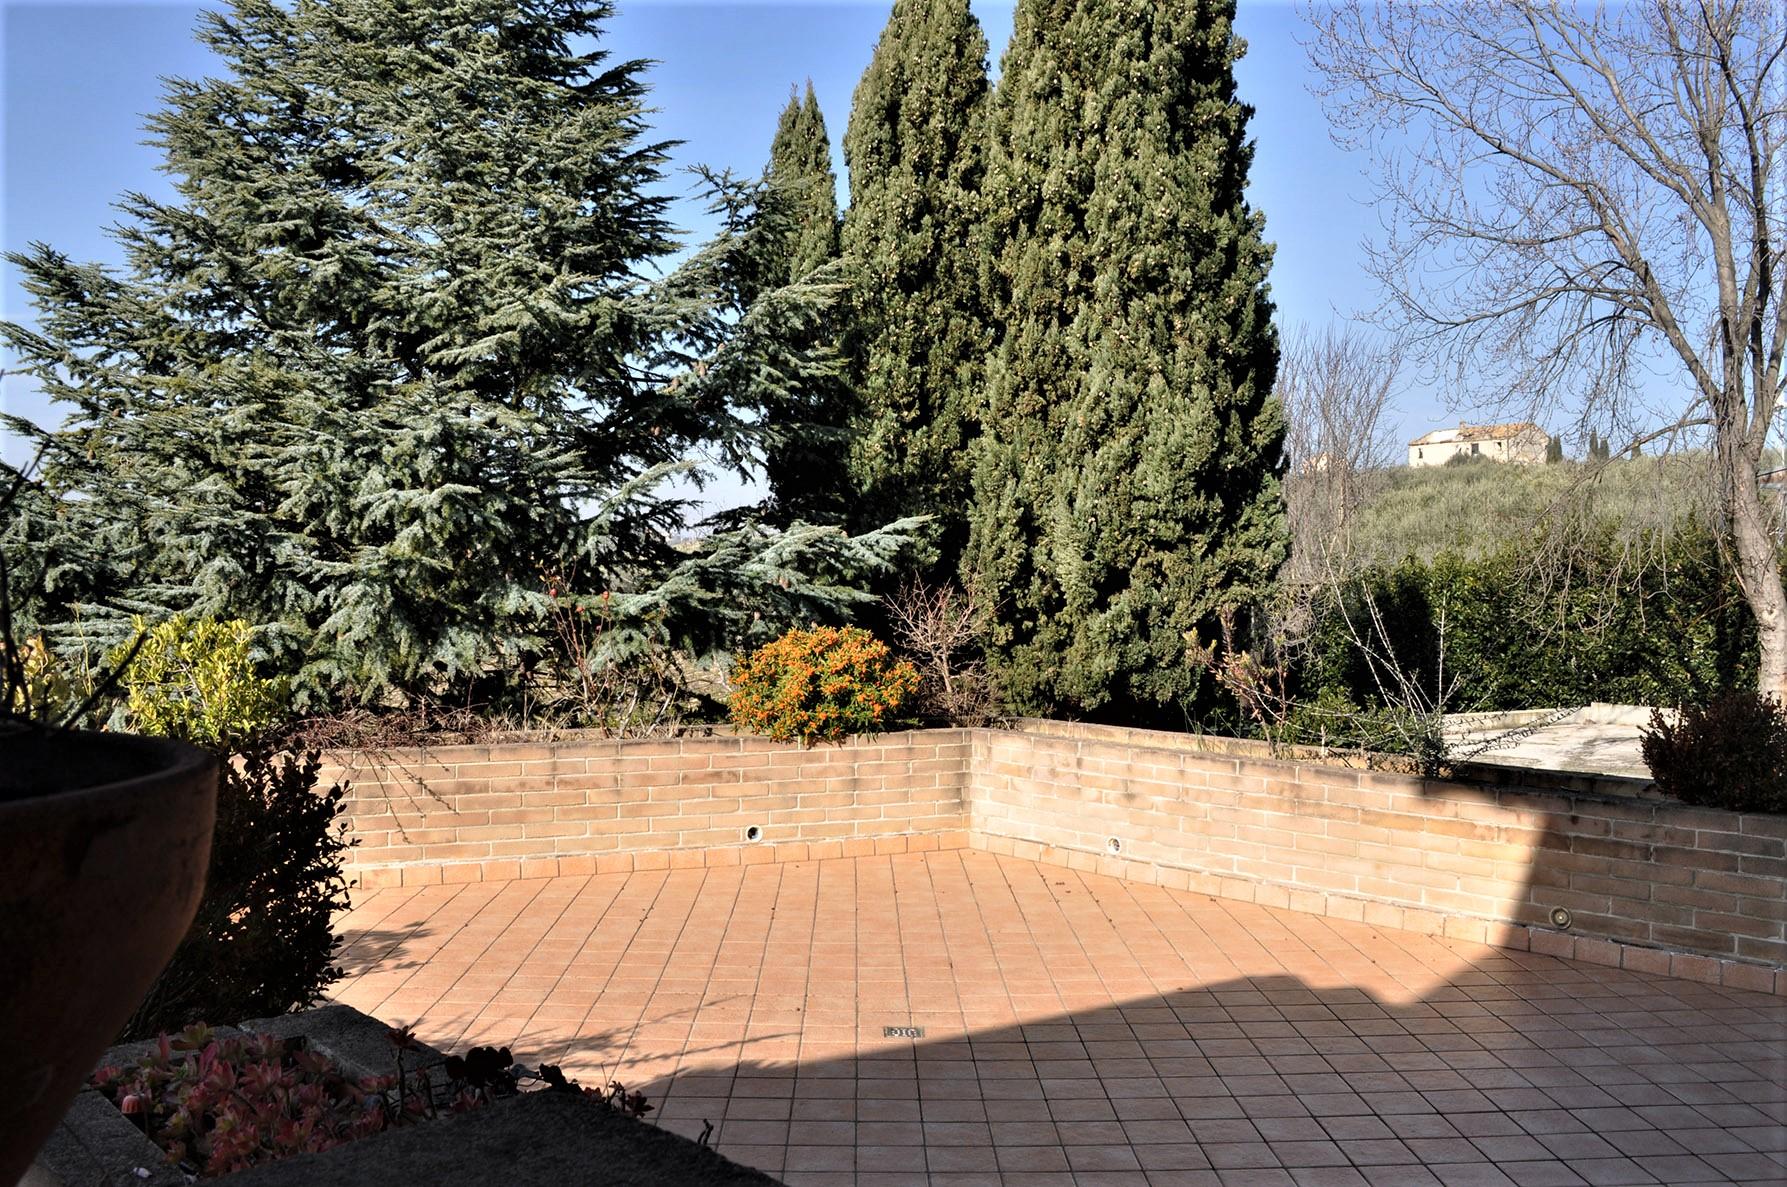 Villa Villa for sale Tortoreto (TE), Villa Bianca - Tortoreto - EUR 770.233 460